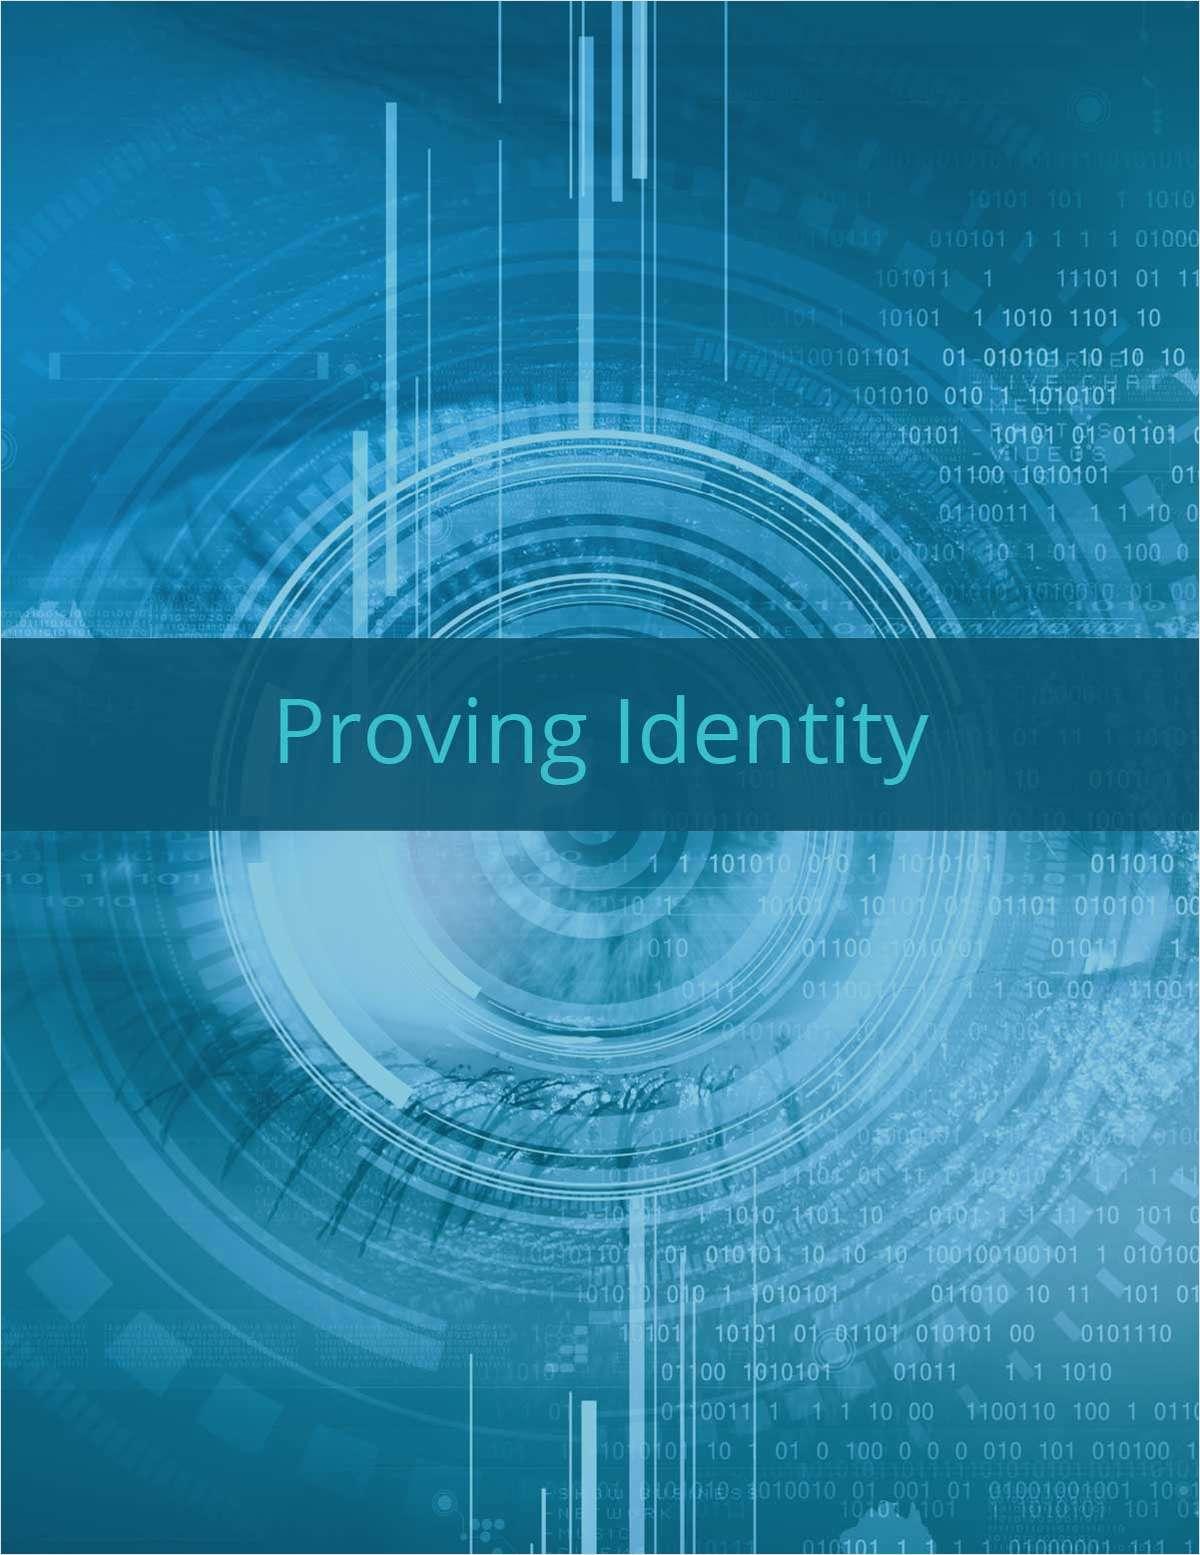 Proving Identity